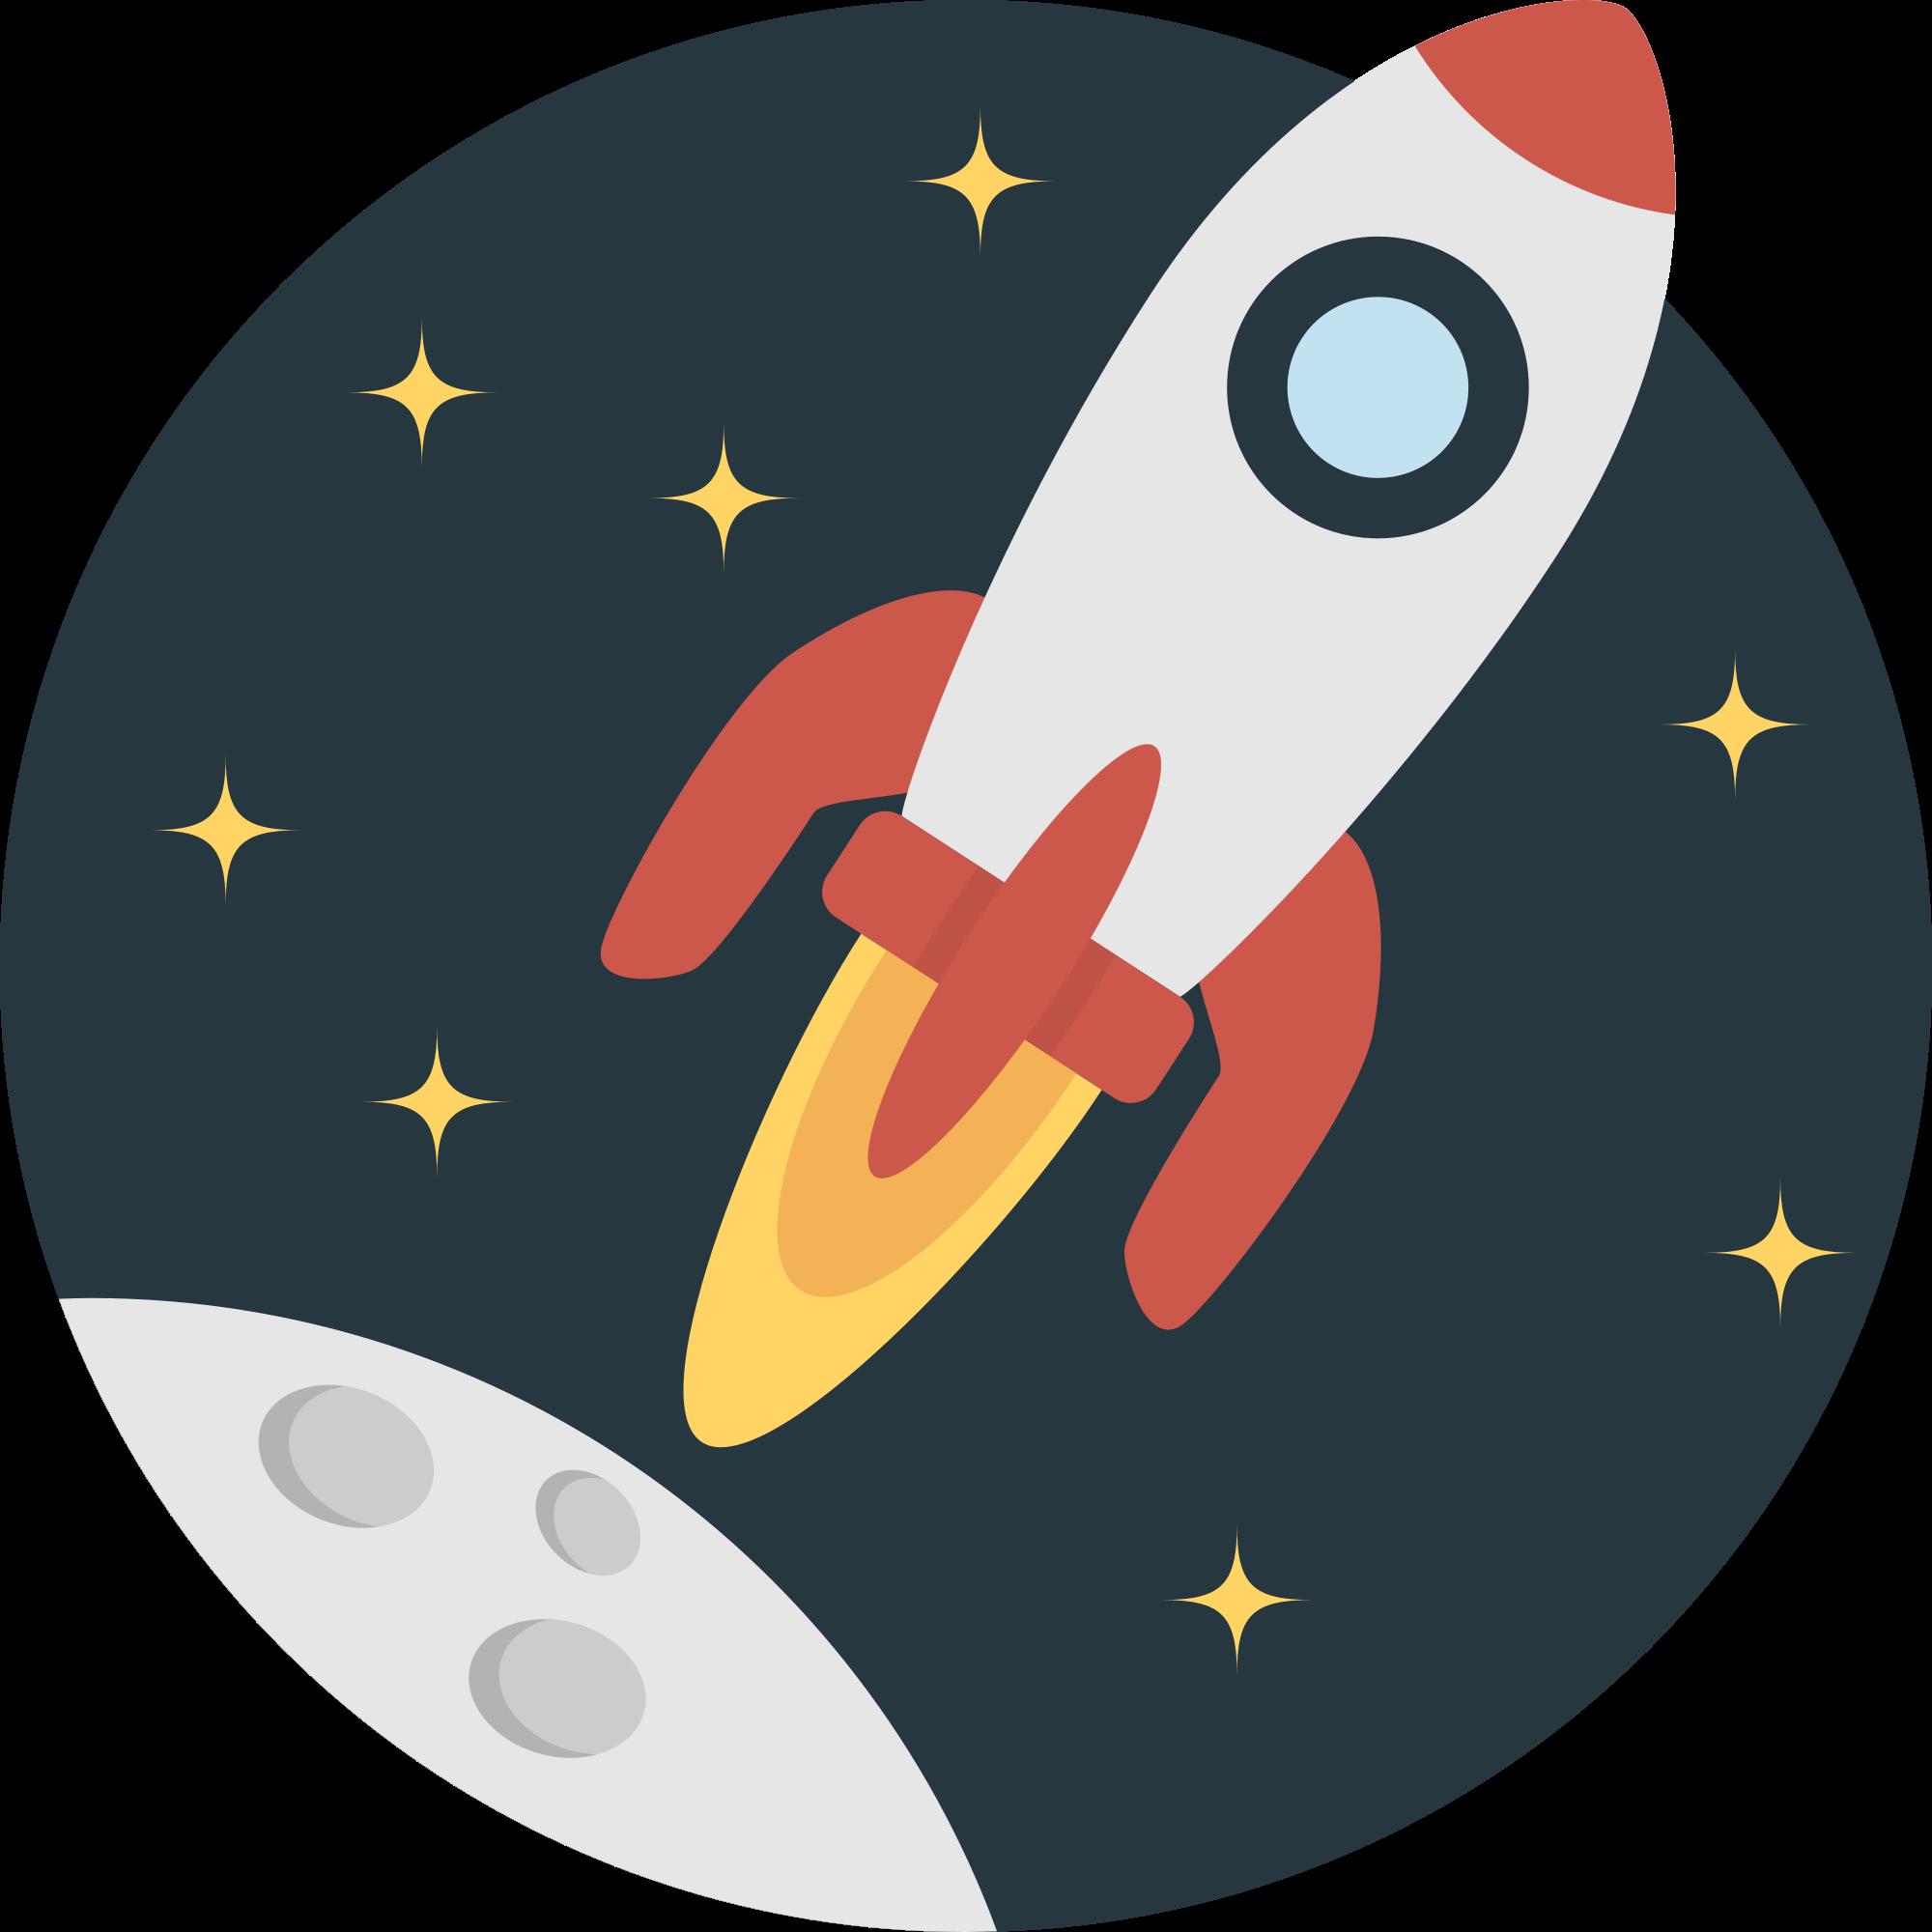 Clipart rocket rocket scientist. File creative tail svg